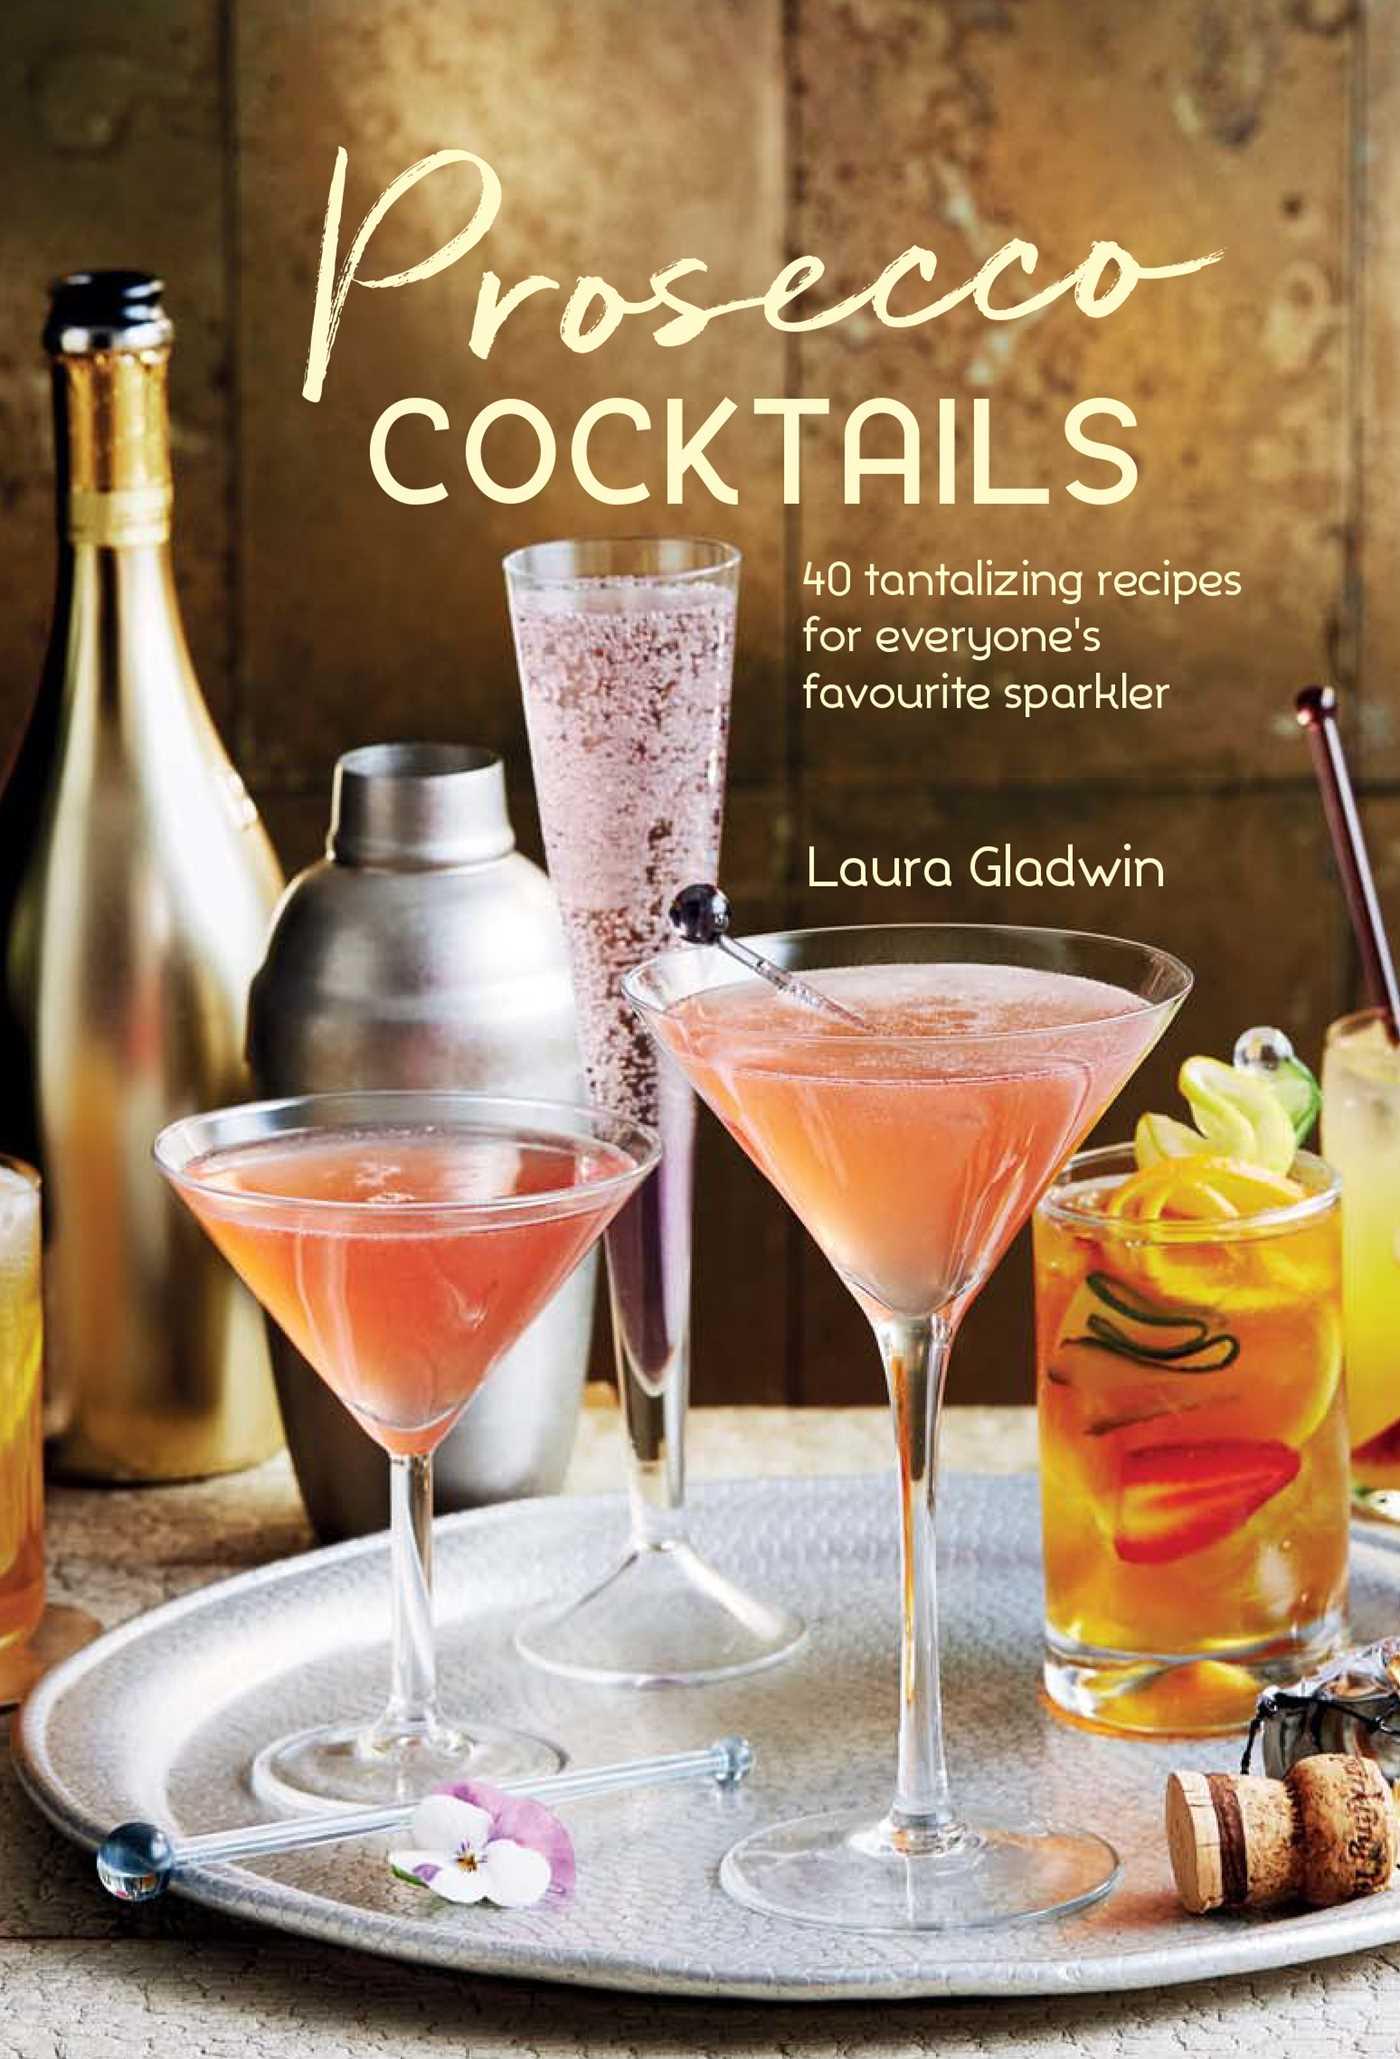 Prosecco cocktails 9781849758956 hr